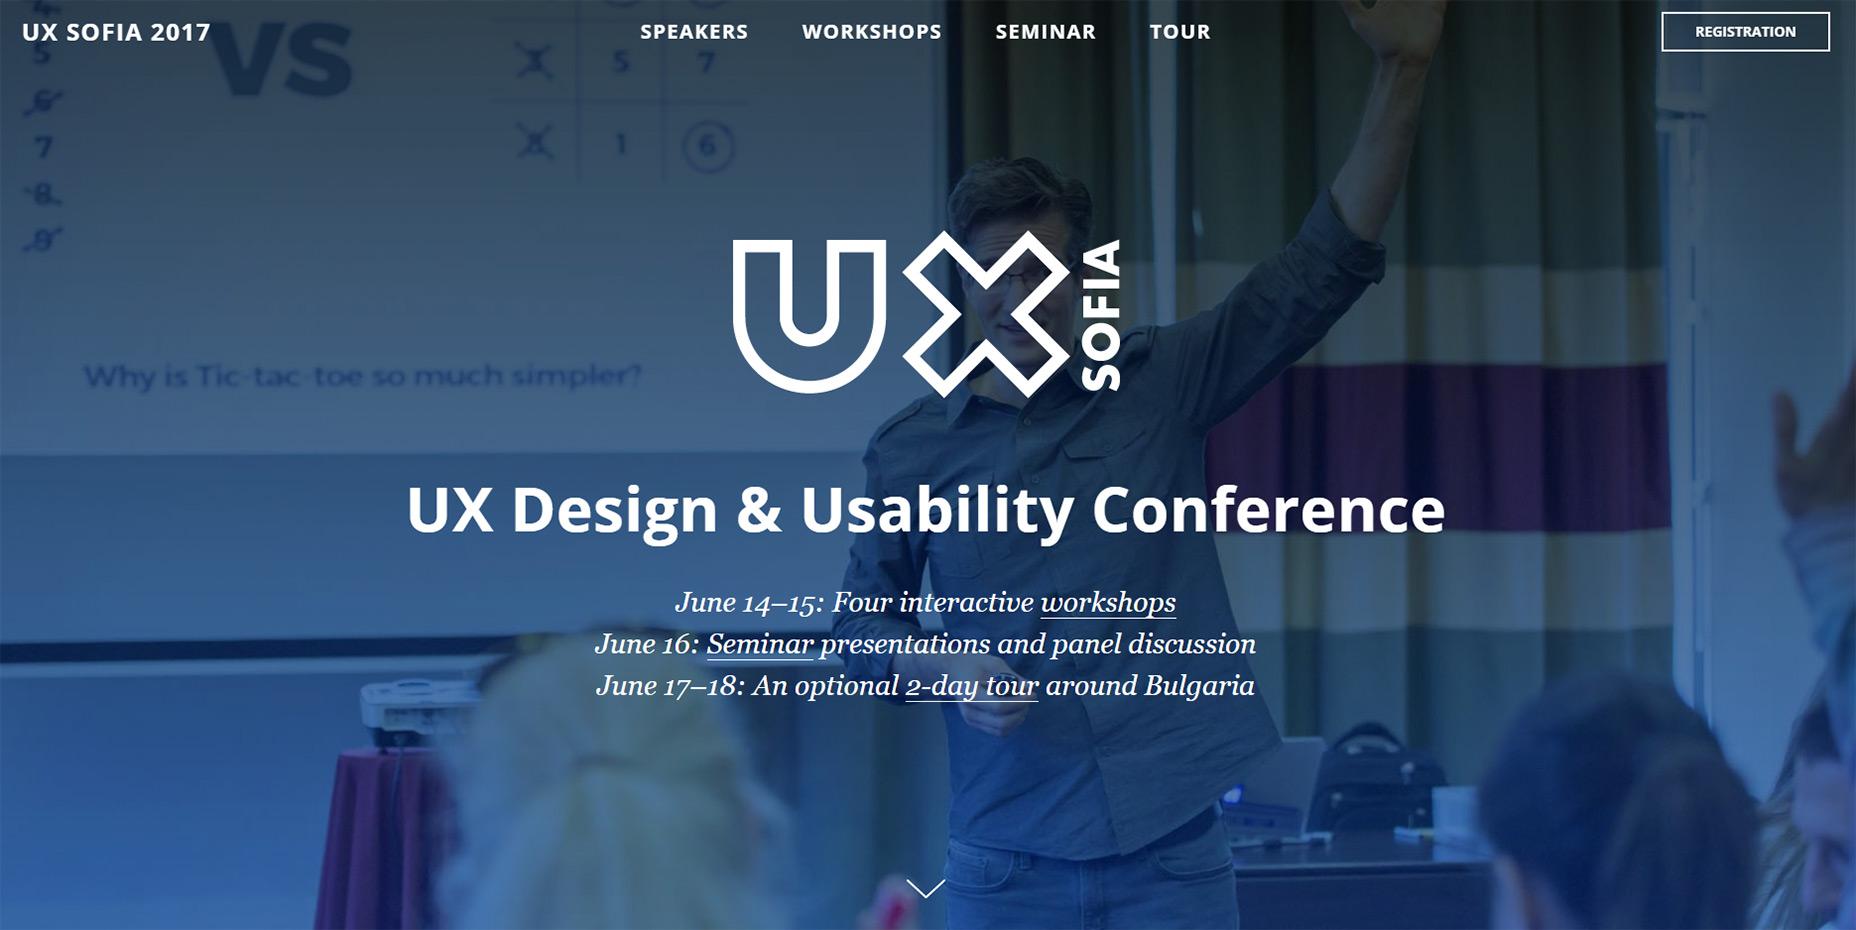 09-ux-sofia-conference